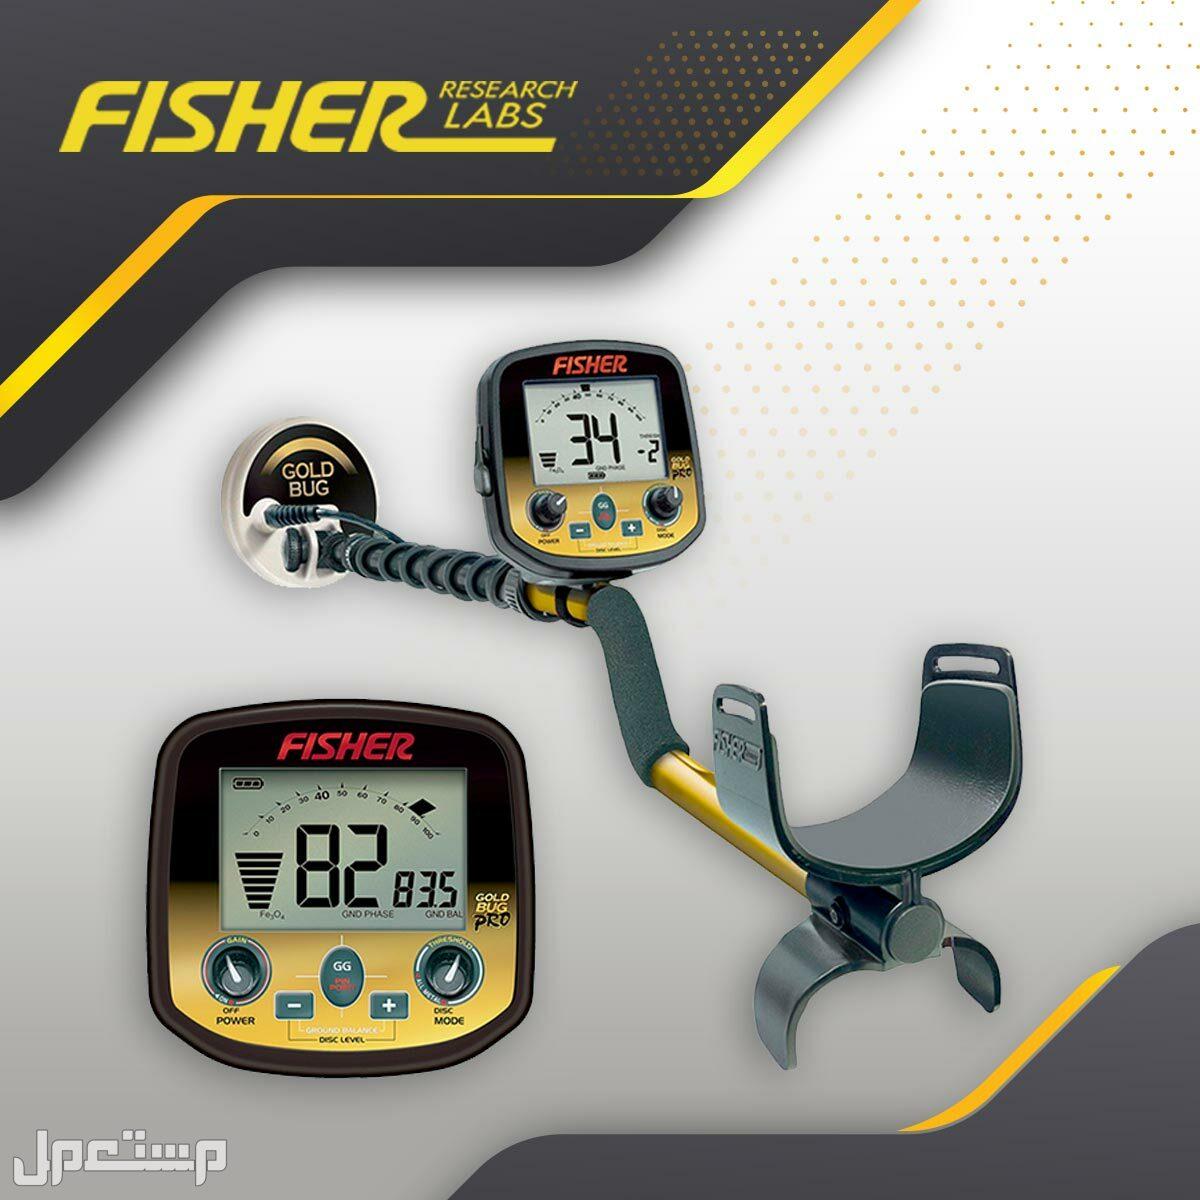 Fisher Gold bug _ الجهاز الاول للتنقيب عن الذهب الخام